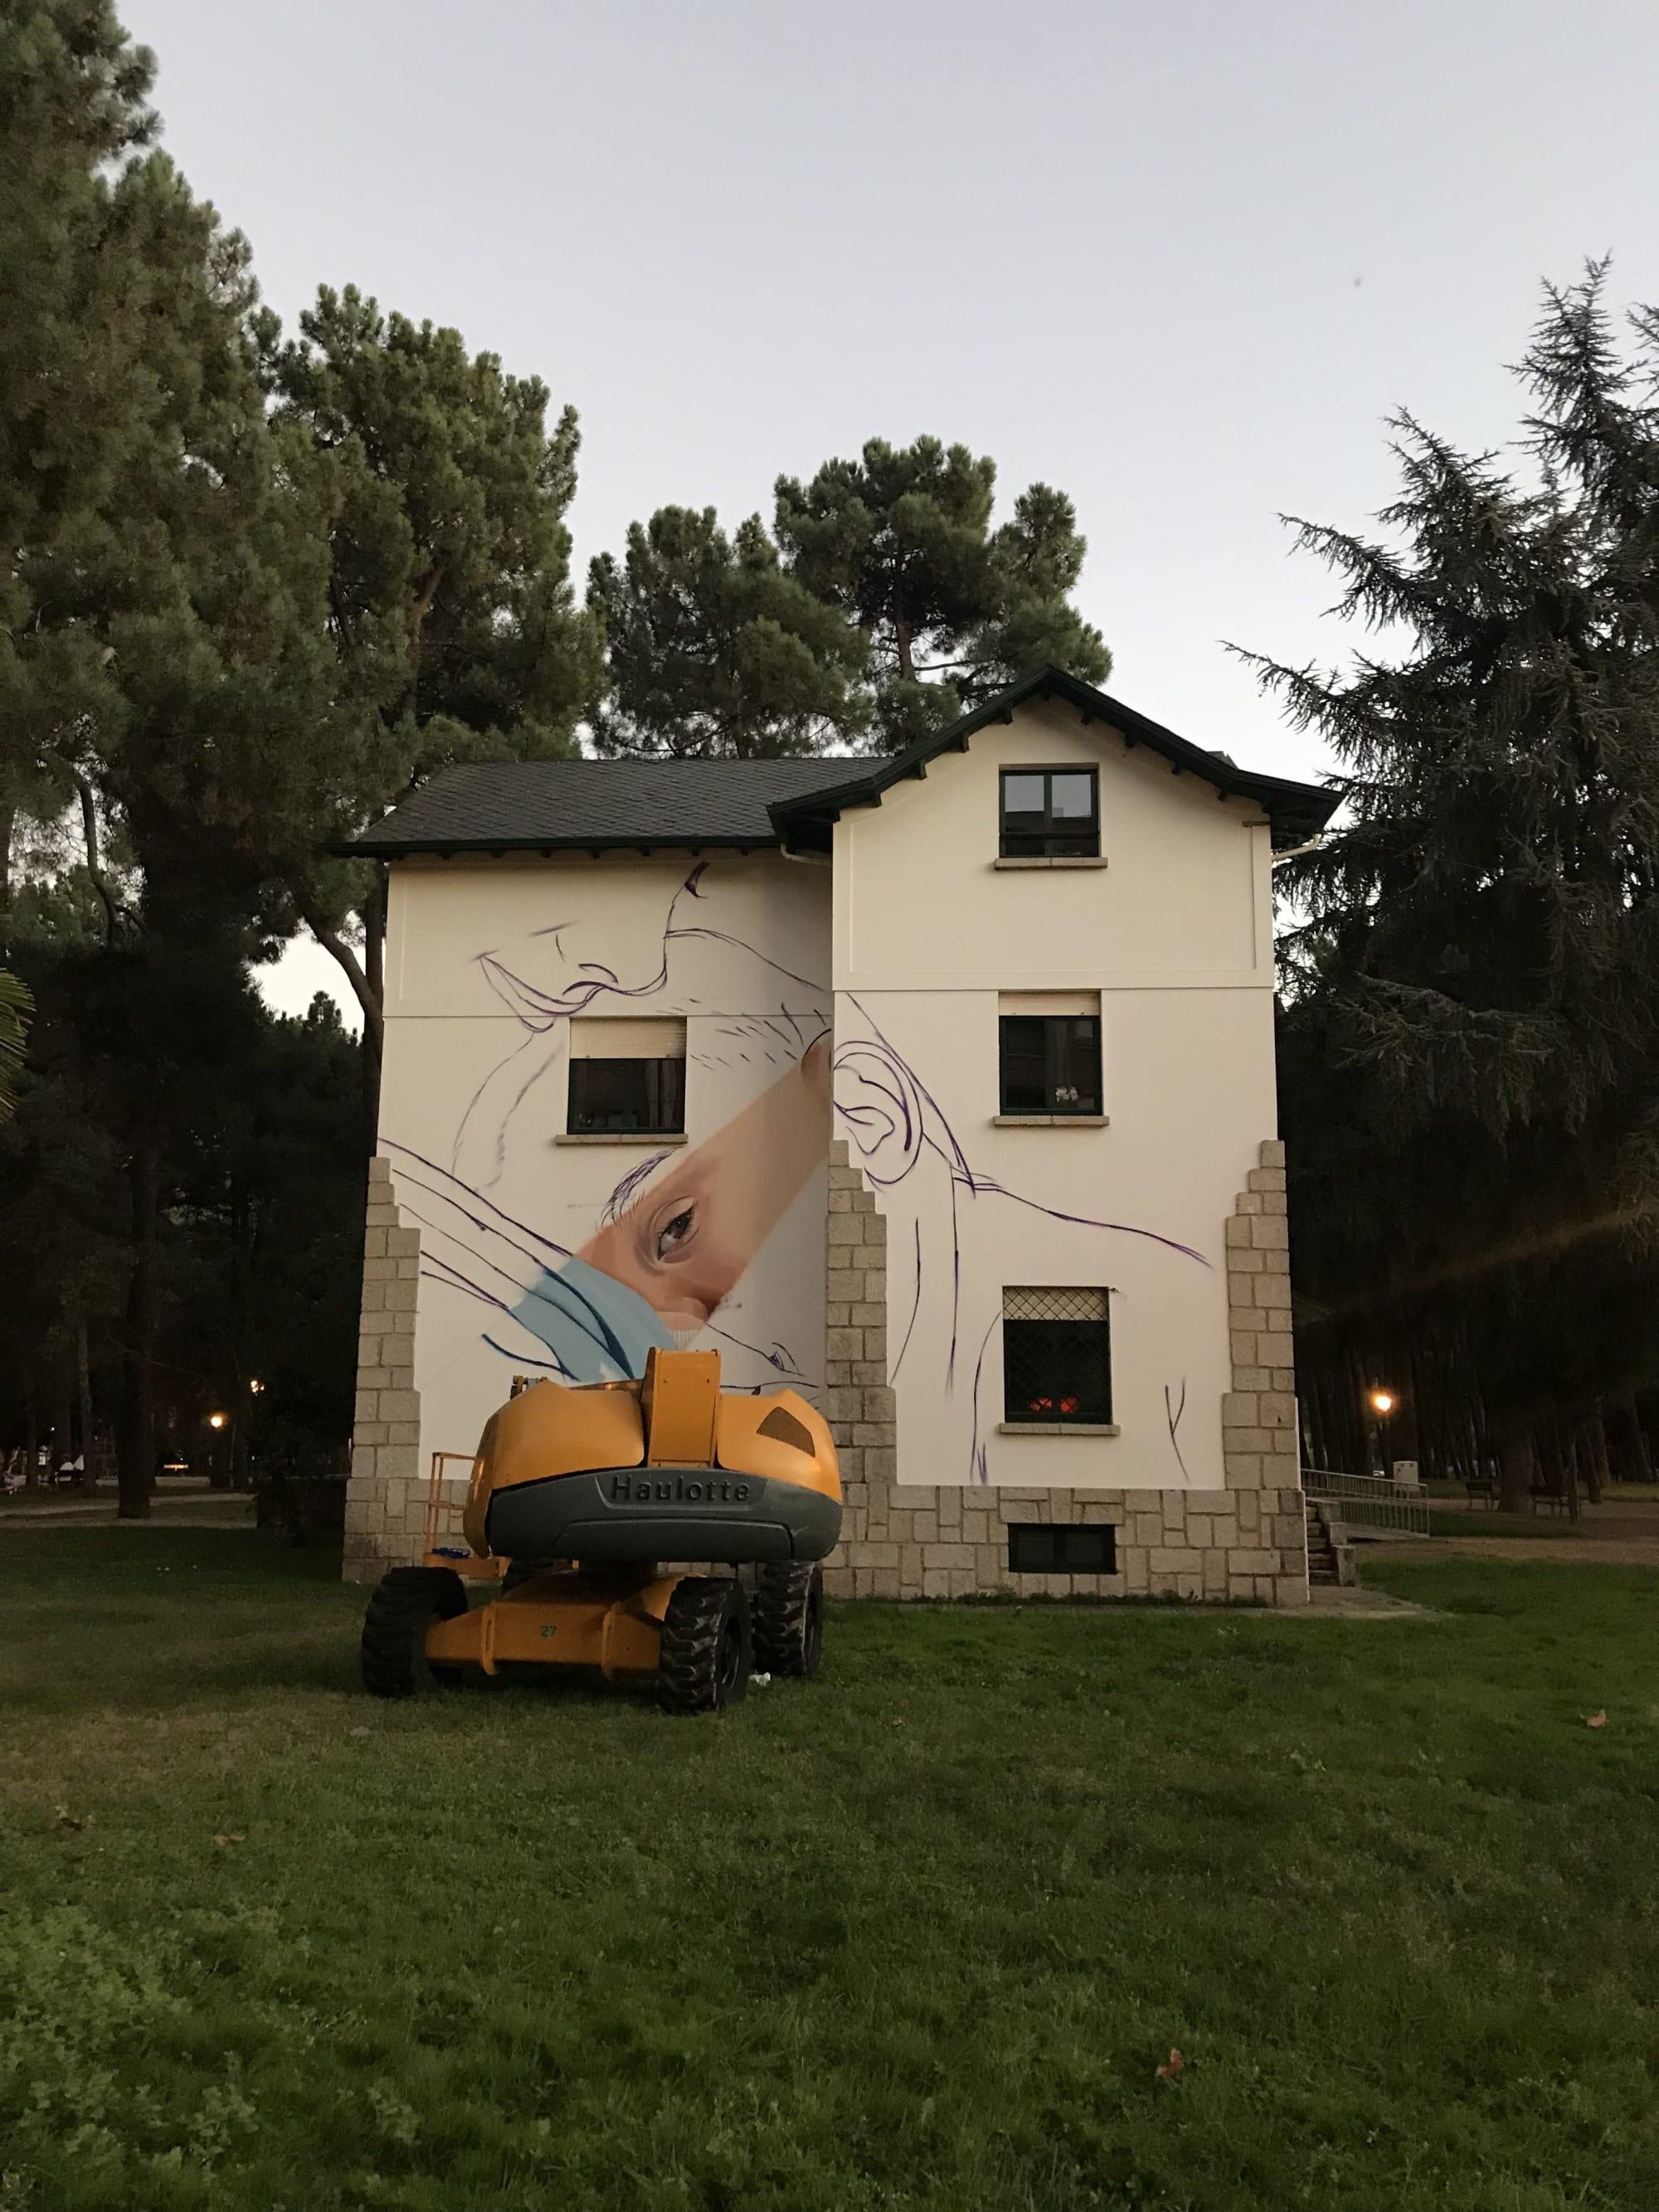 Street Murals by Asier Vera seen at Temple Park, Ponferrada, León - World breastfeeding day